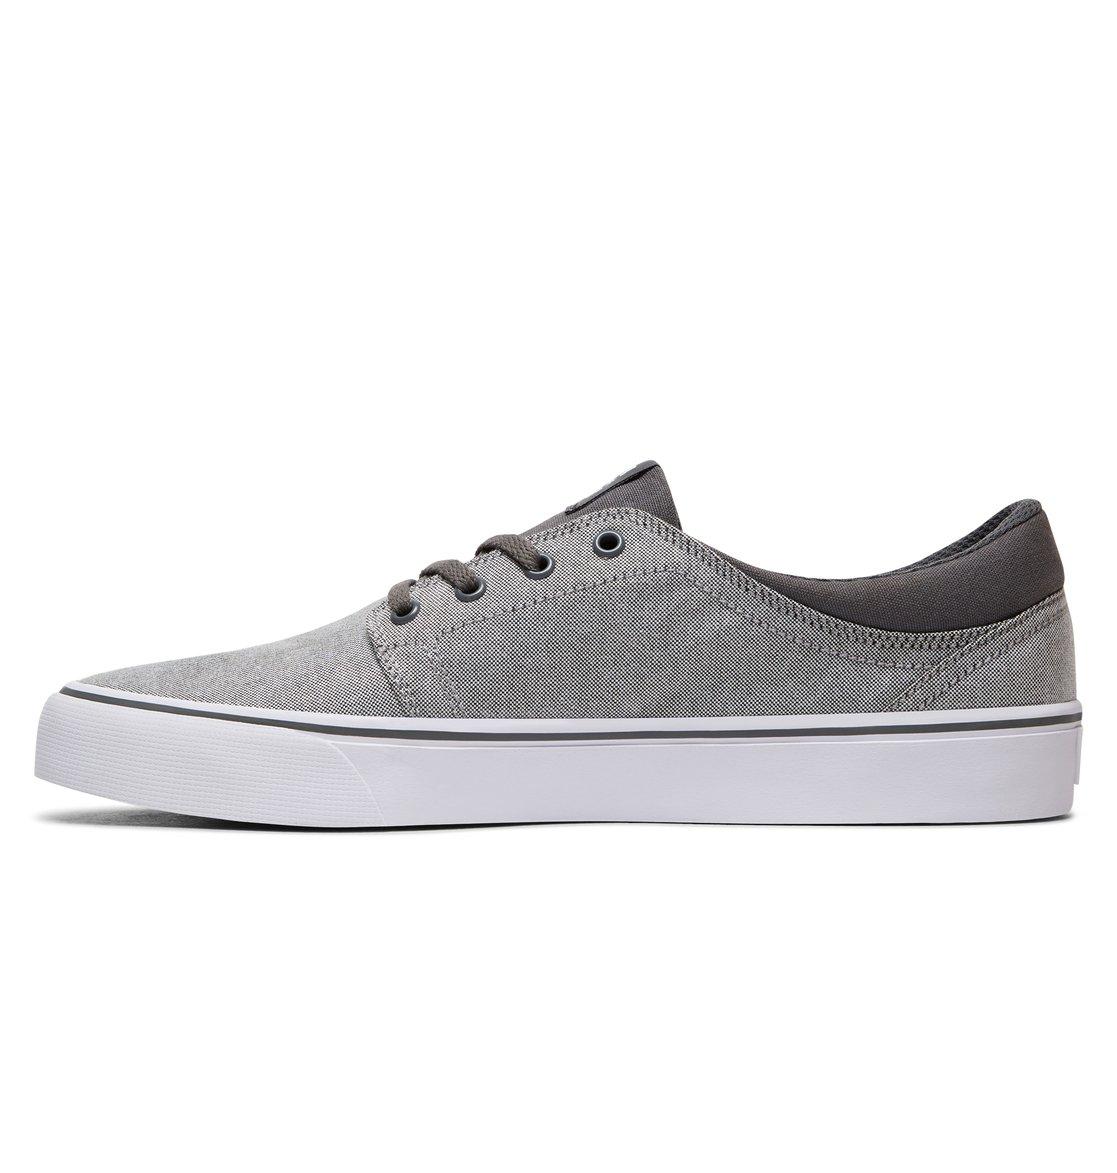 DC Shoes Trase TX SE - Shoes - Zapatos - Hombre - 12.5 ygtj2Lv